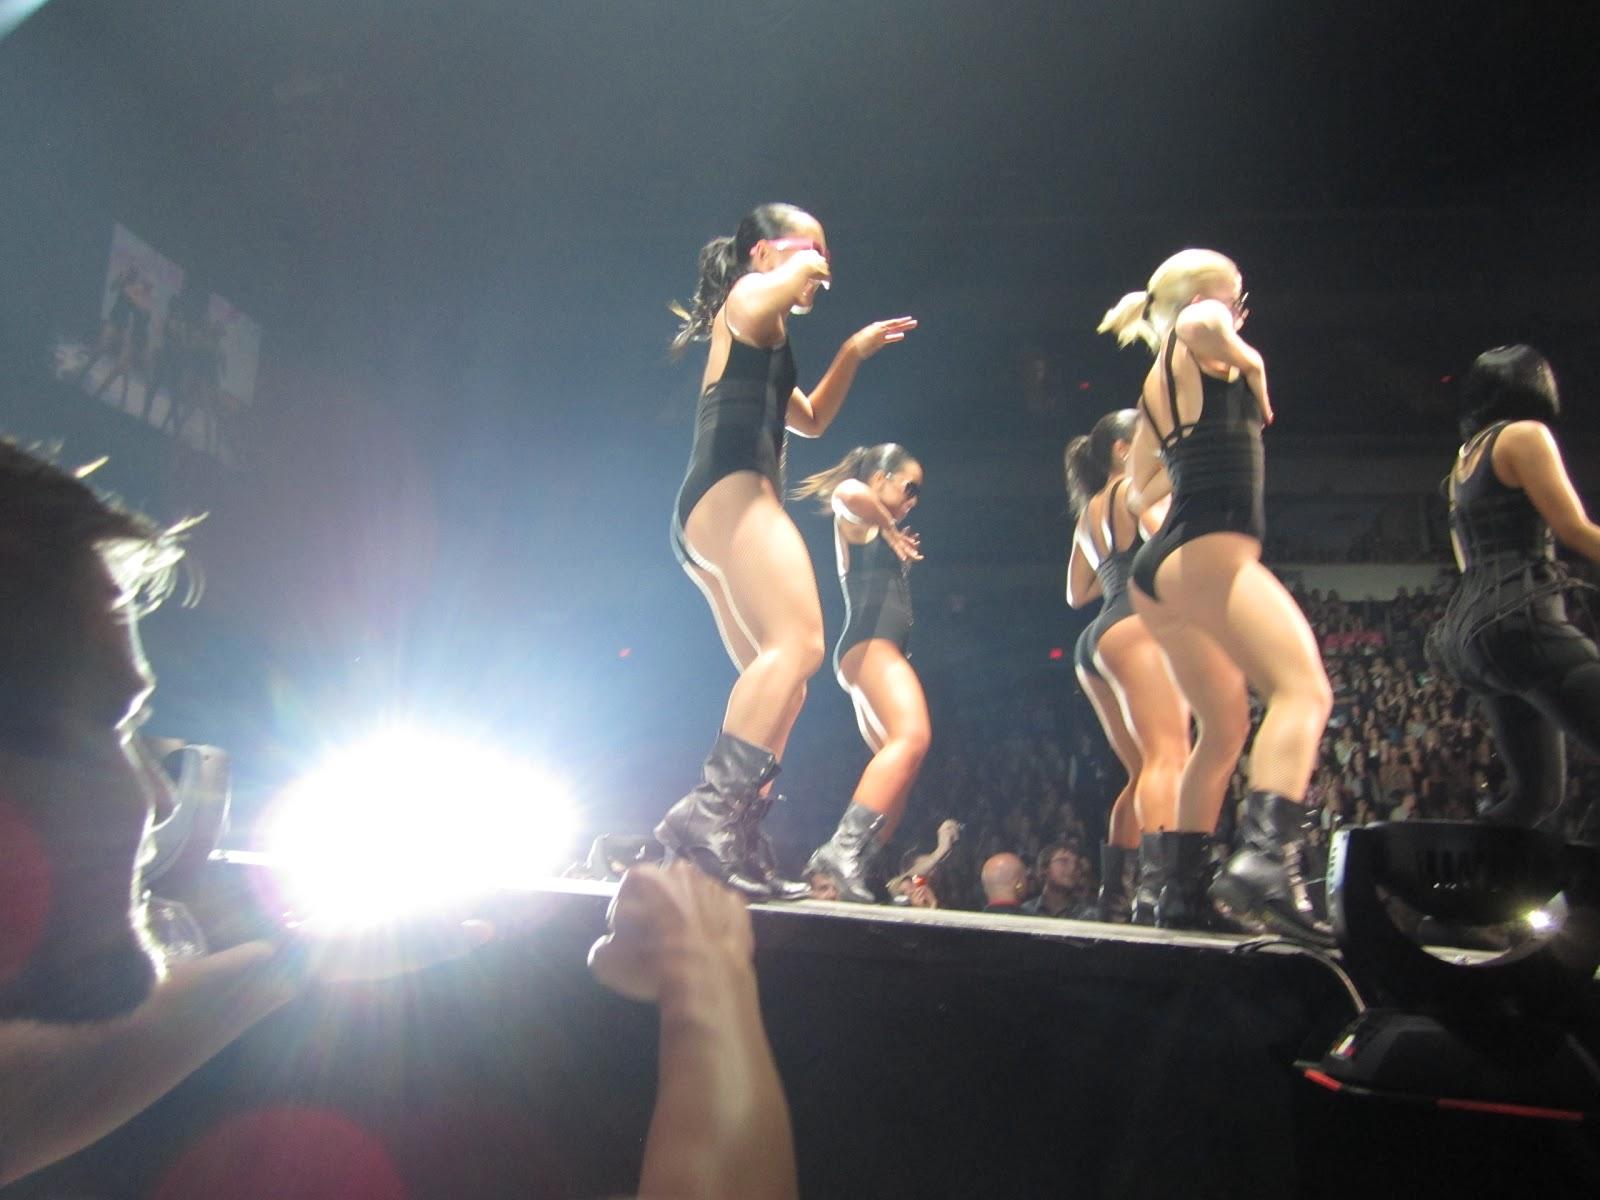 http://1.bp.blogspot.com/-YxcXlmdP88g/TkrJWX1CJDI/AAAAAAAAACY/pZZtII5vCzI/s1600/Britney+037.jpg